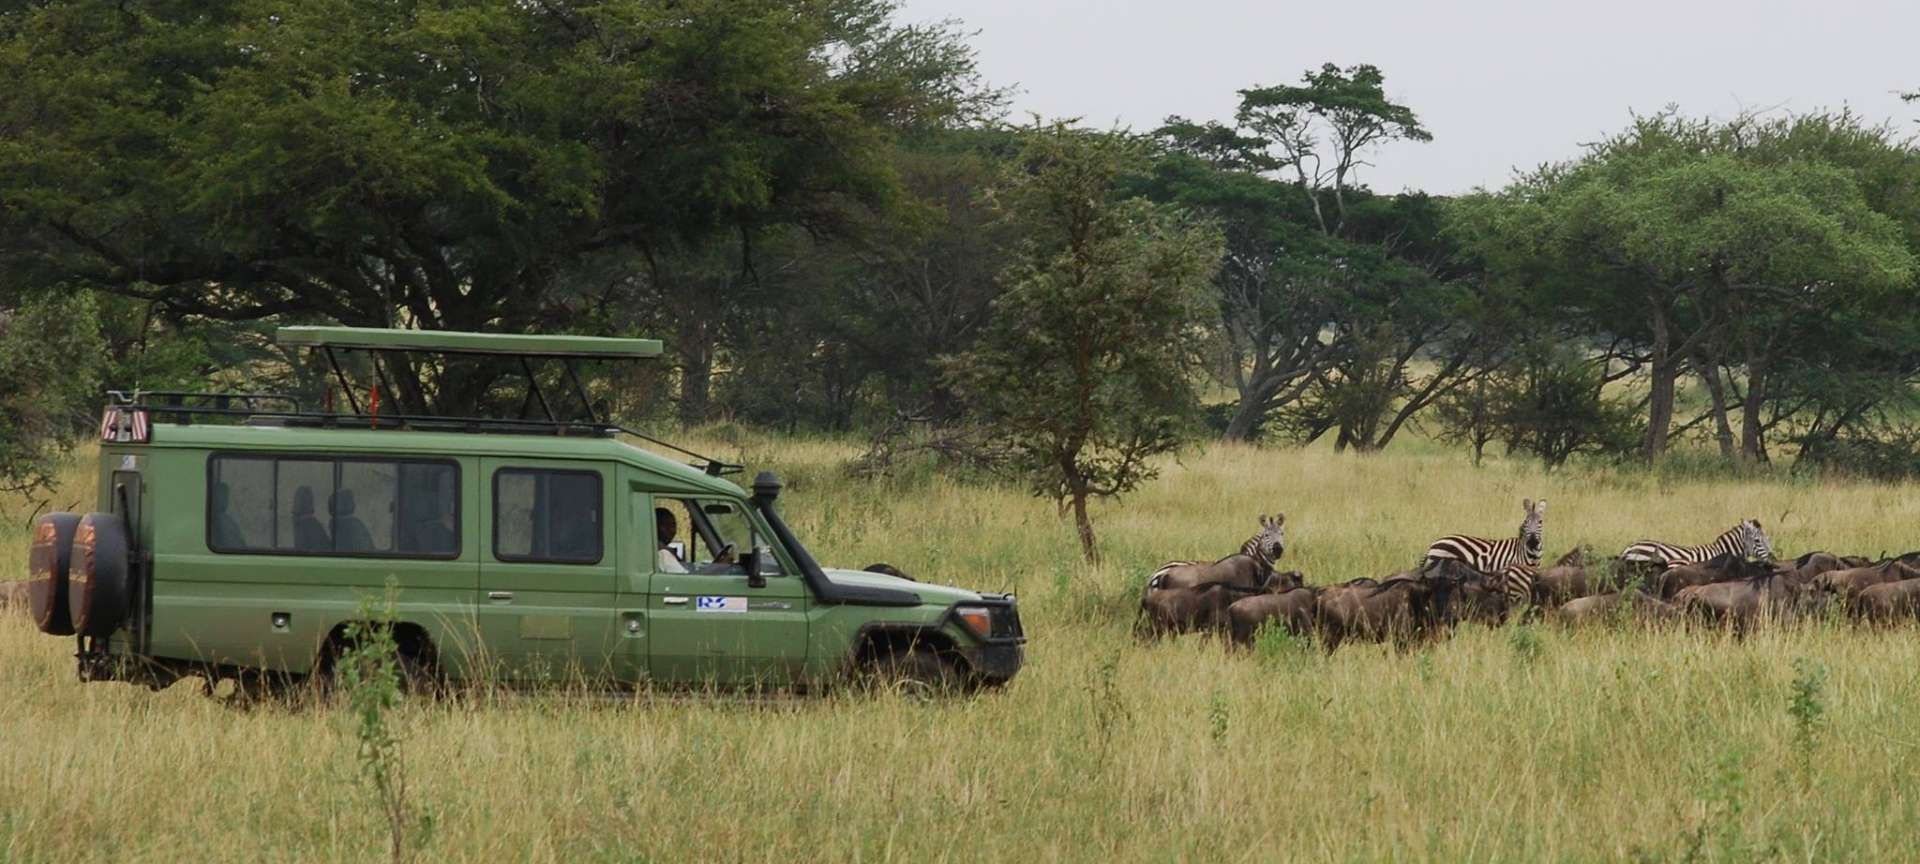 Serengeti Explorer Camp Discover Africa Safaris